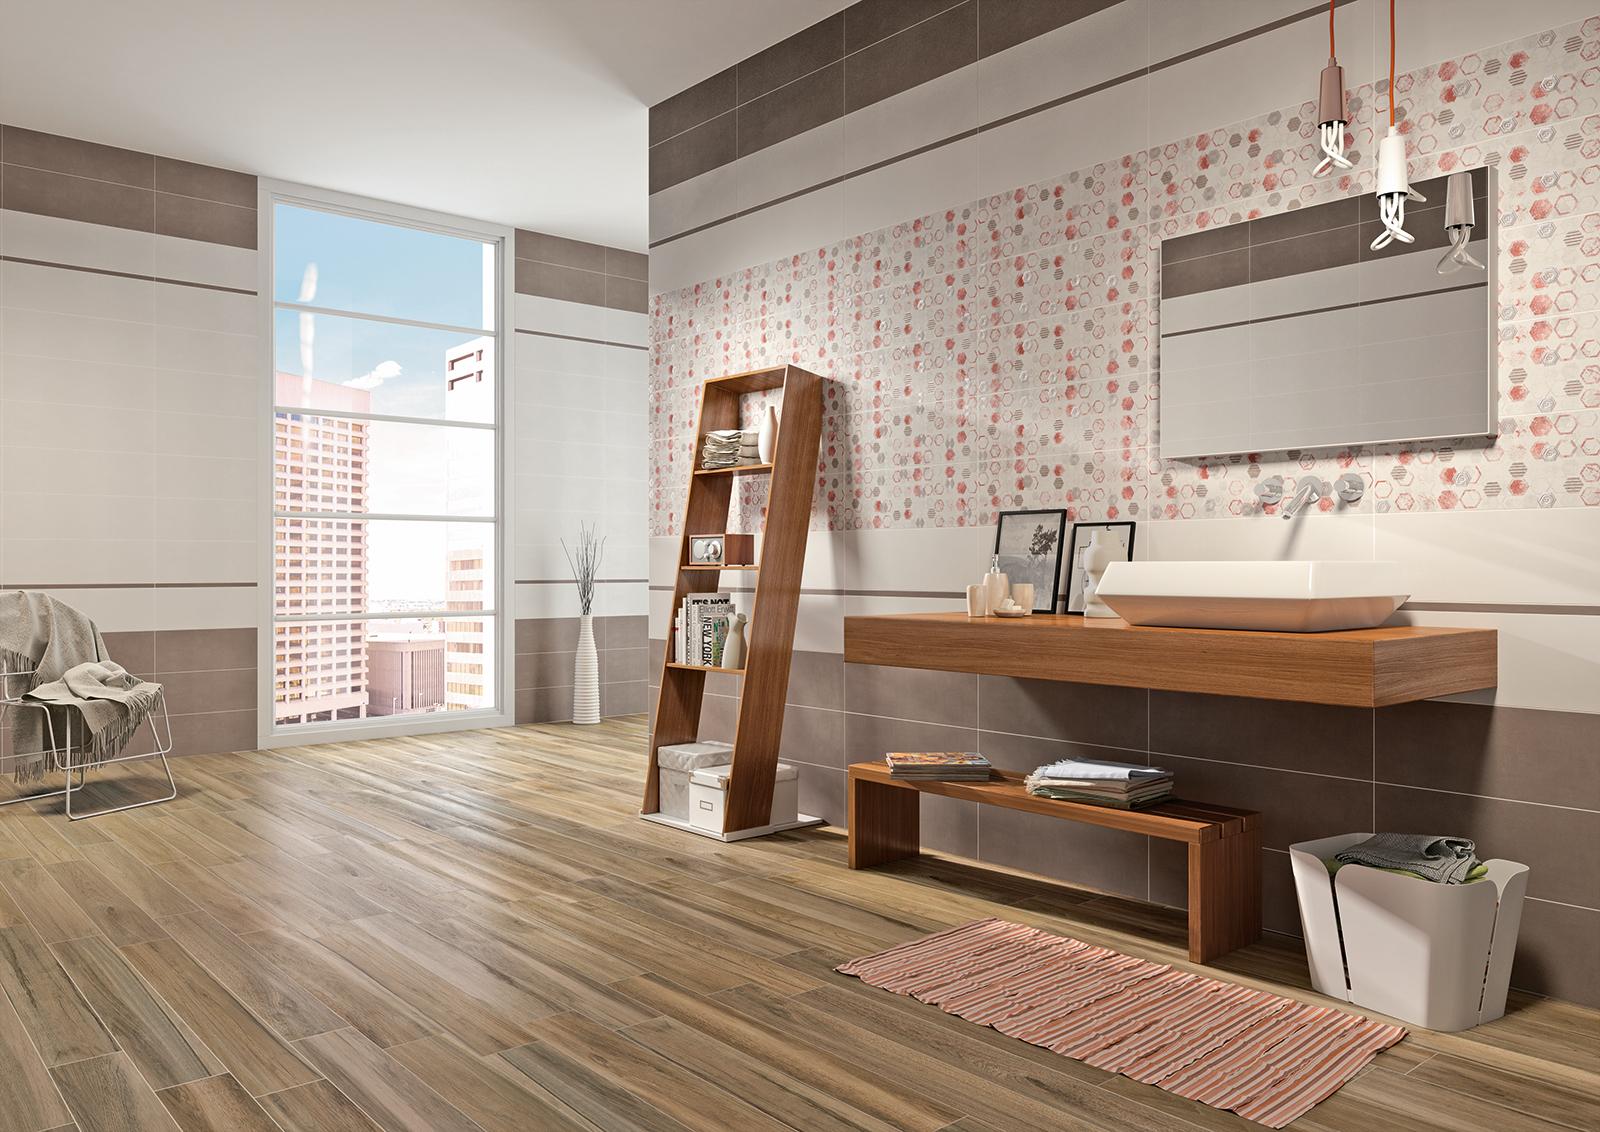 Kontact rivestimento bagno amaranto armonie - Rivestimento bagno design ...